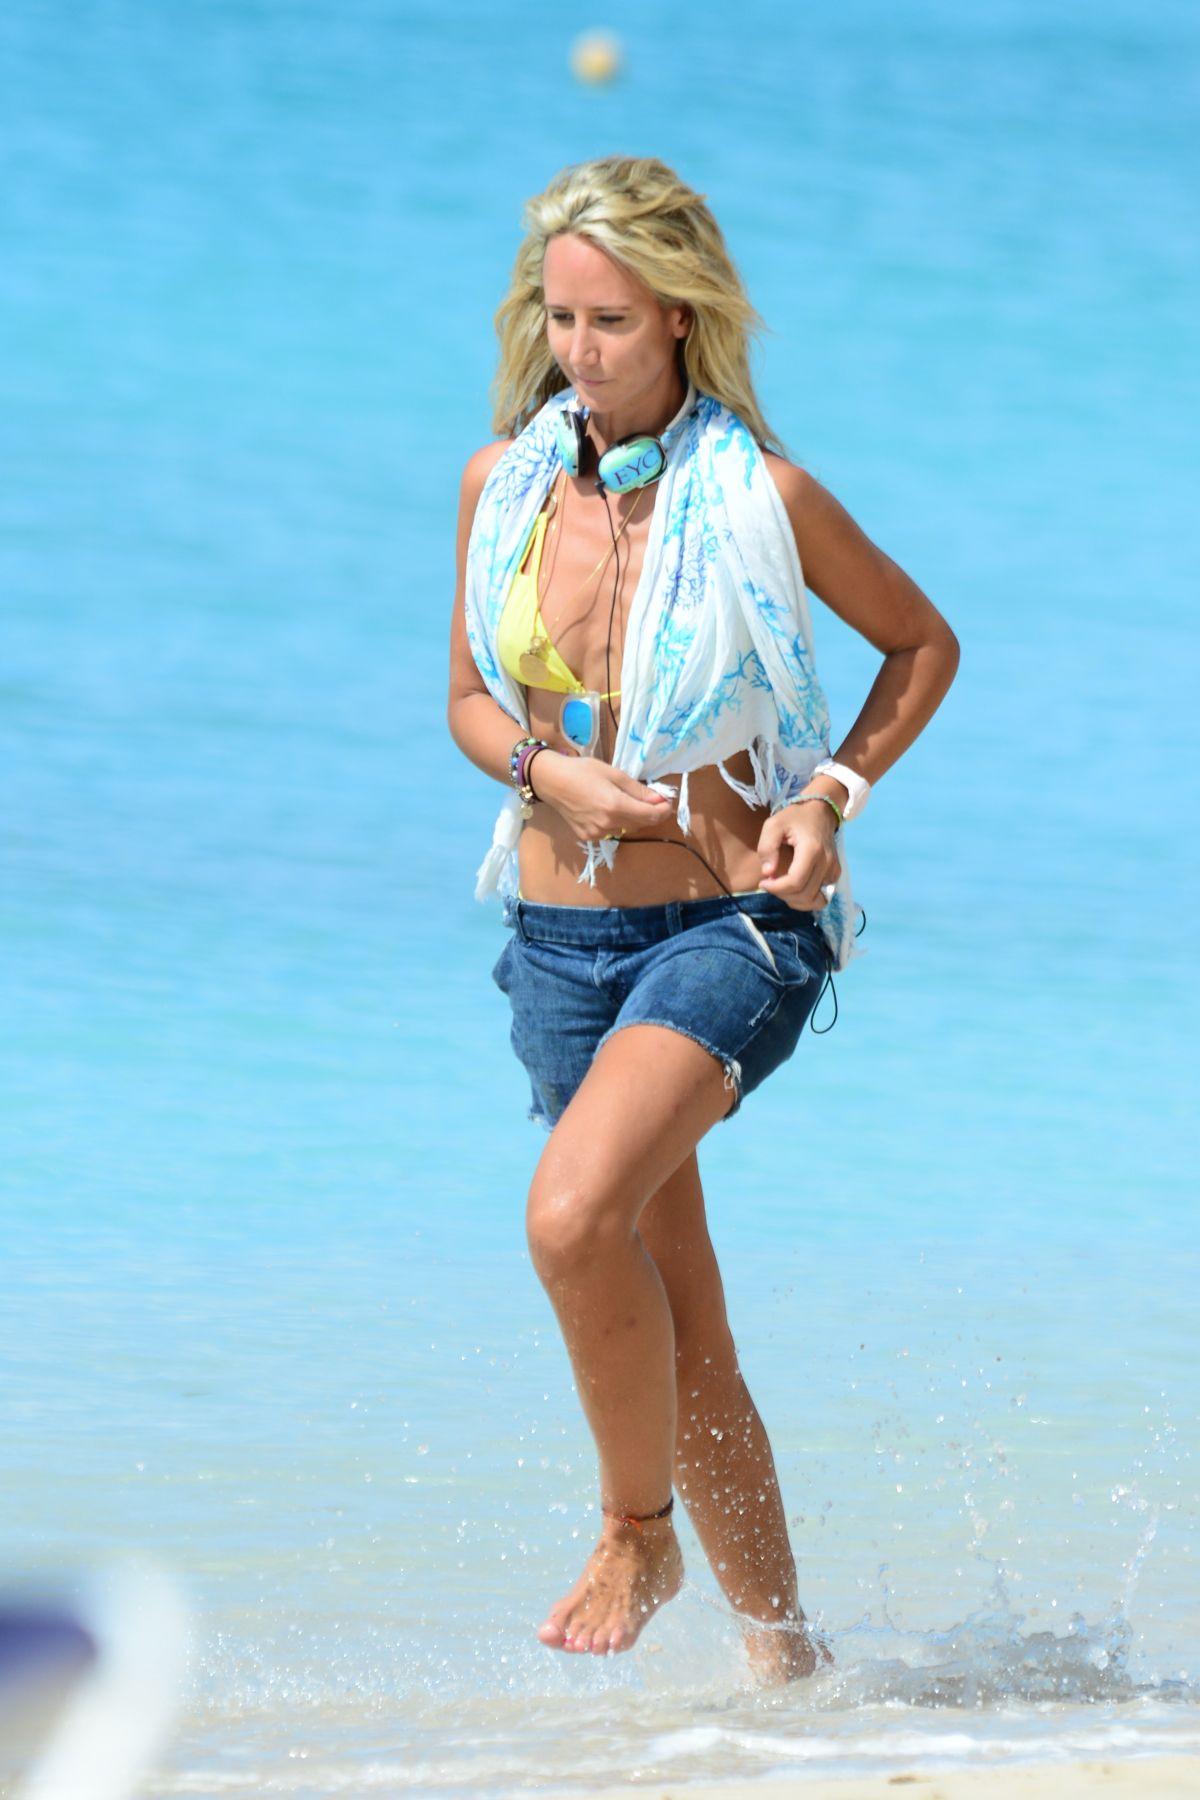 Lady Victoria Hervey in Bikini Boat Party in Barbados Pic 22 of 35